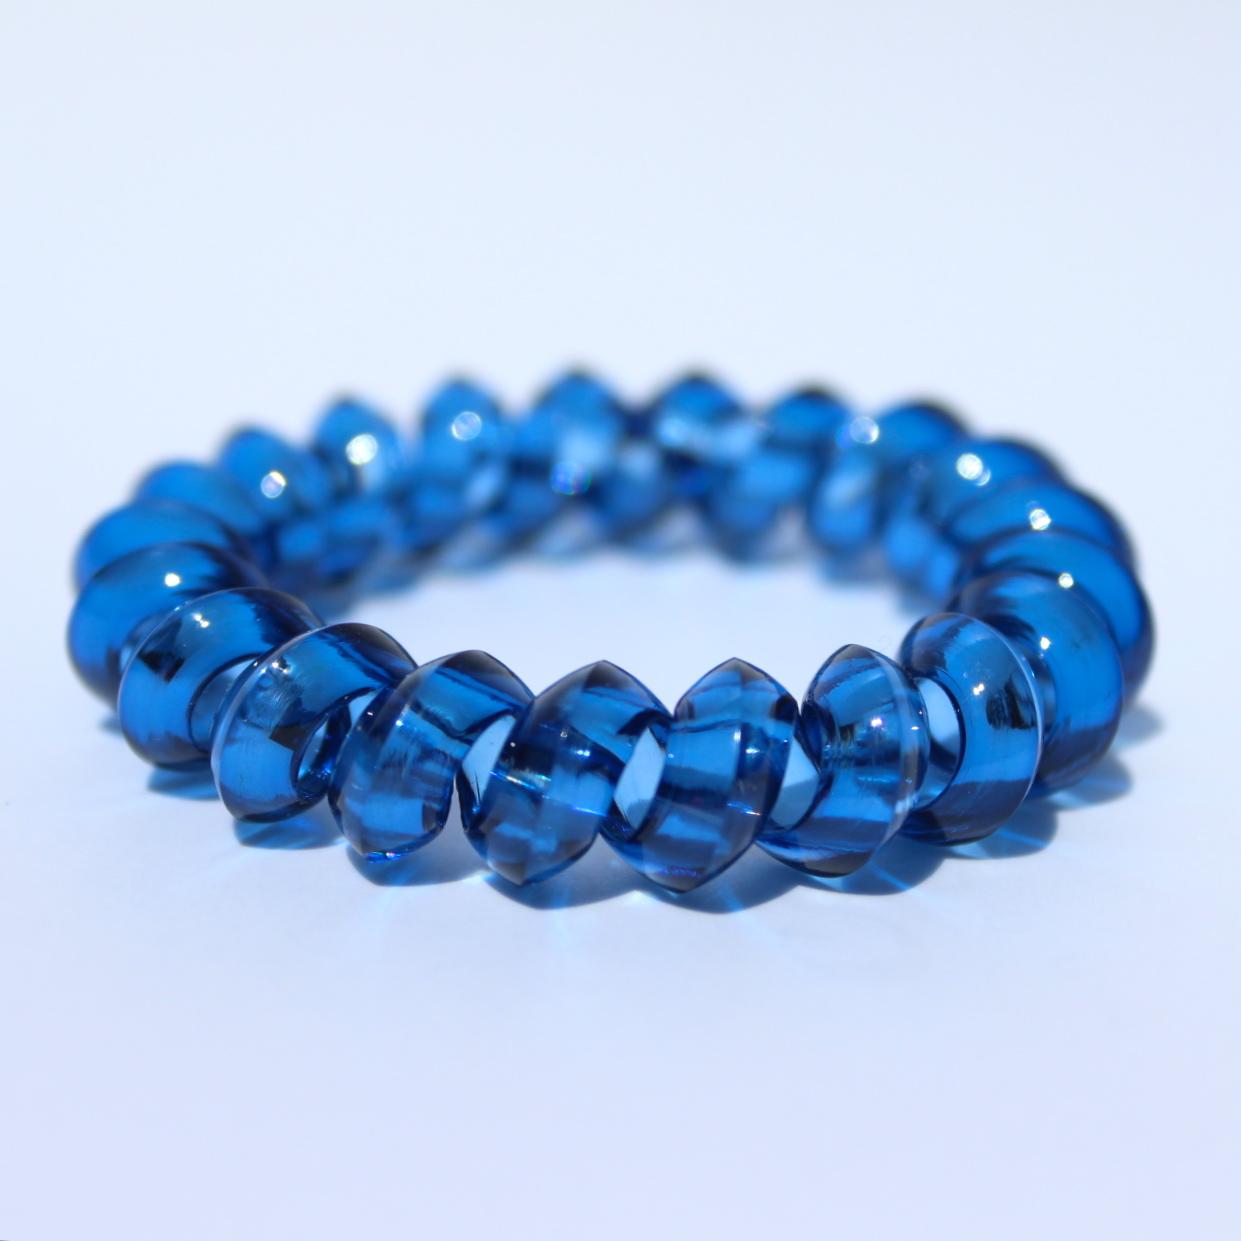 Tmavomodrá gumička do vlasov Hairfix - Crystal Špicaté Dark Blue